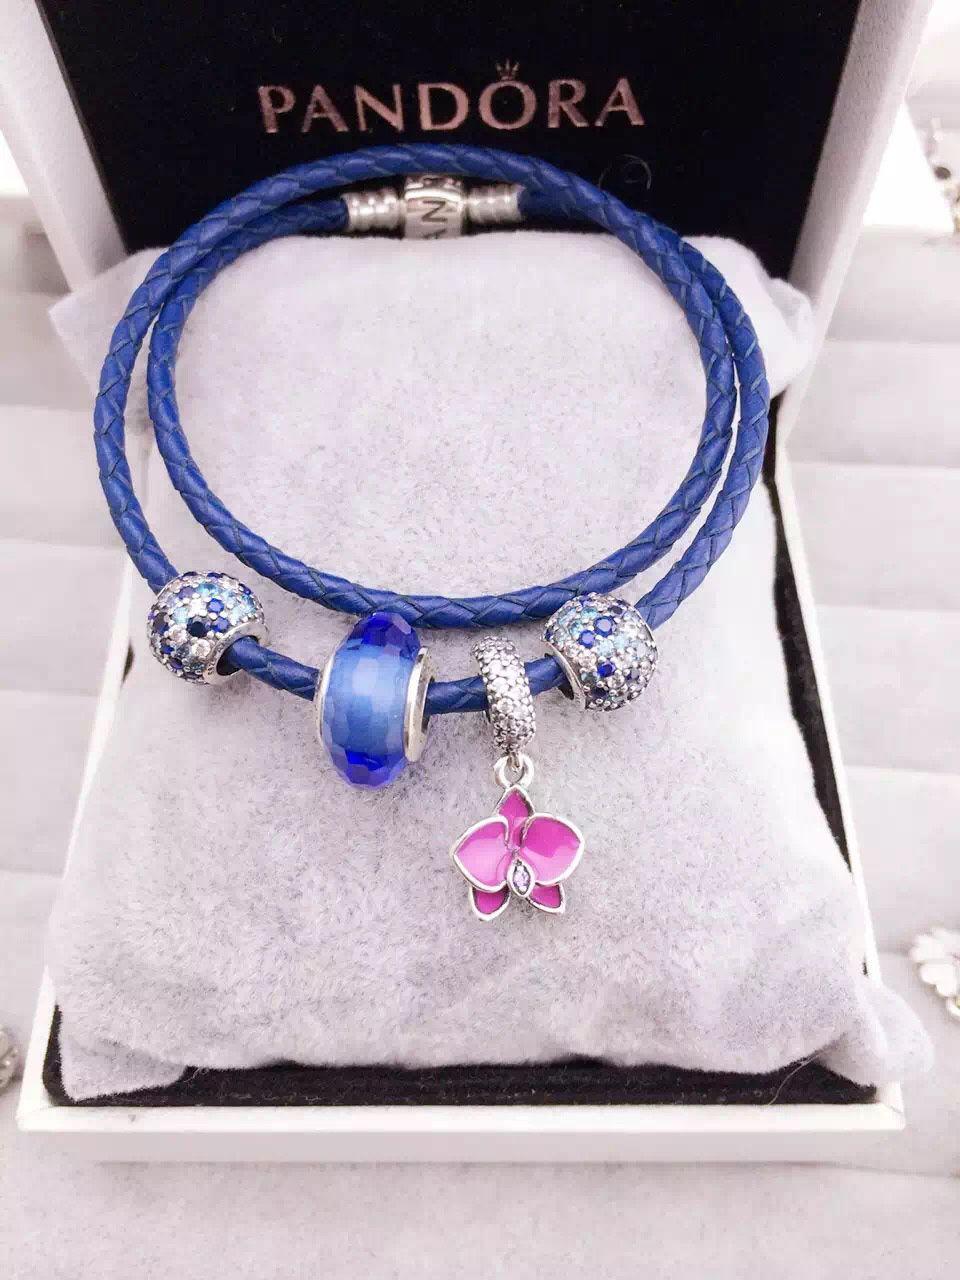 50% OFF!!! $139 Pandora Charm Bracelet. Hot Sale!!! SKU: CB01011 - PANDORA Bracelet Ideas